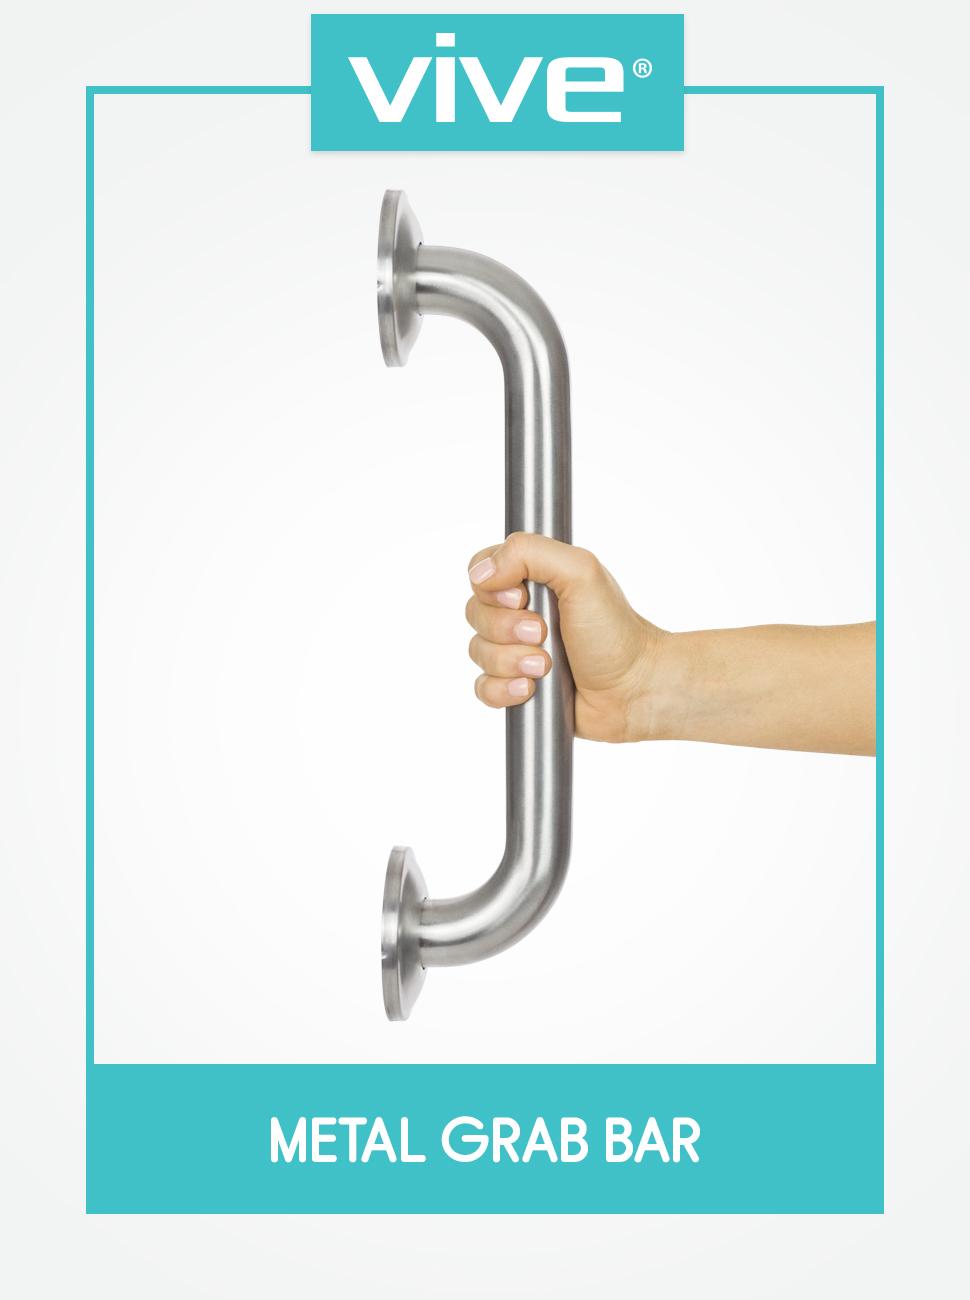 Vive Metal Grab Bar - Balance amp; Handrail Shower Assist - Bathroom amp; Bathtub Mounted Safety Hand